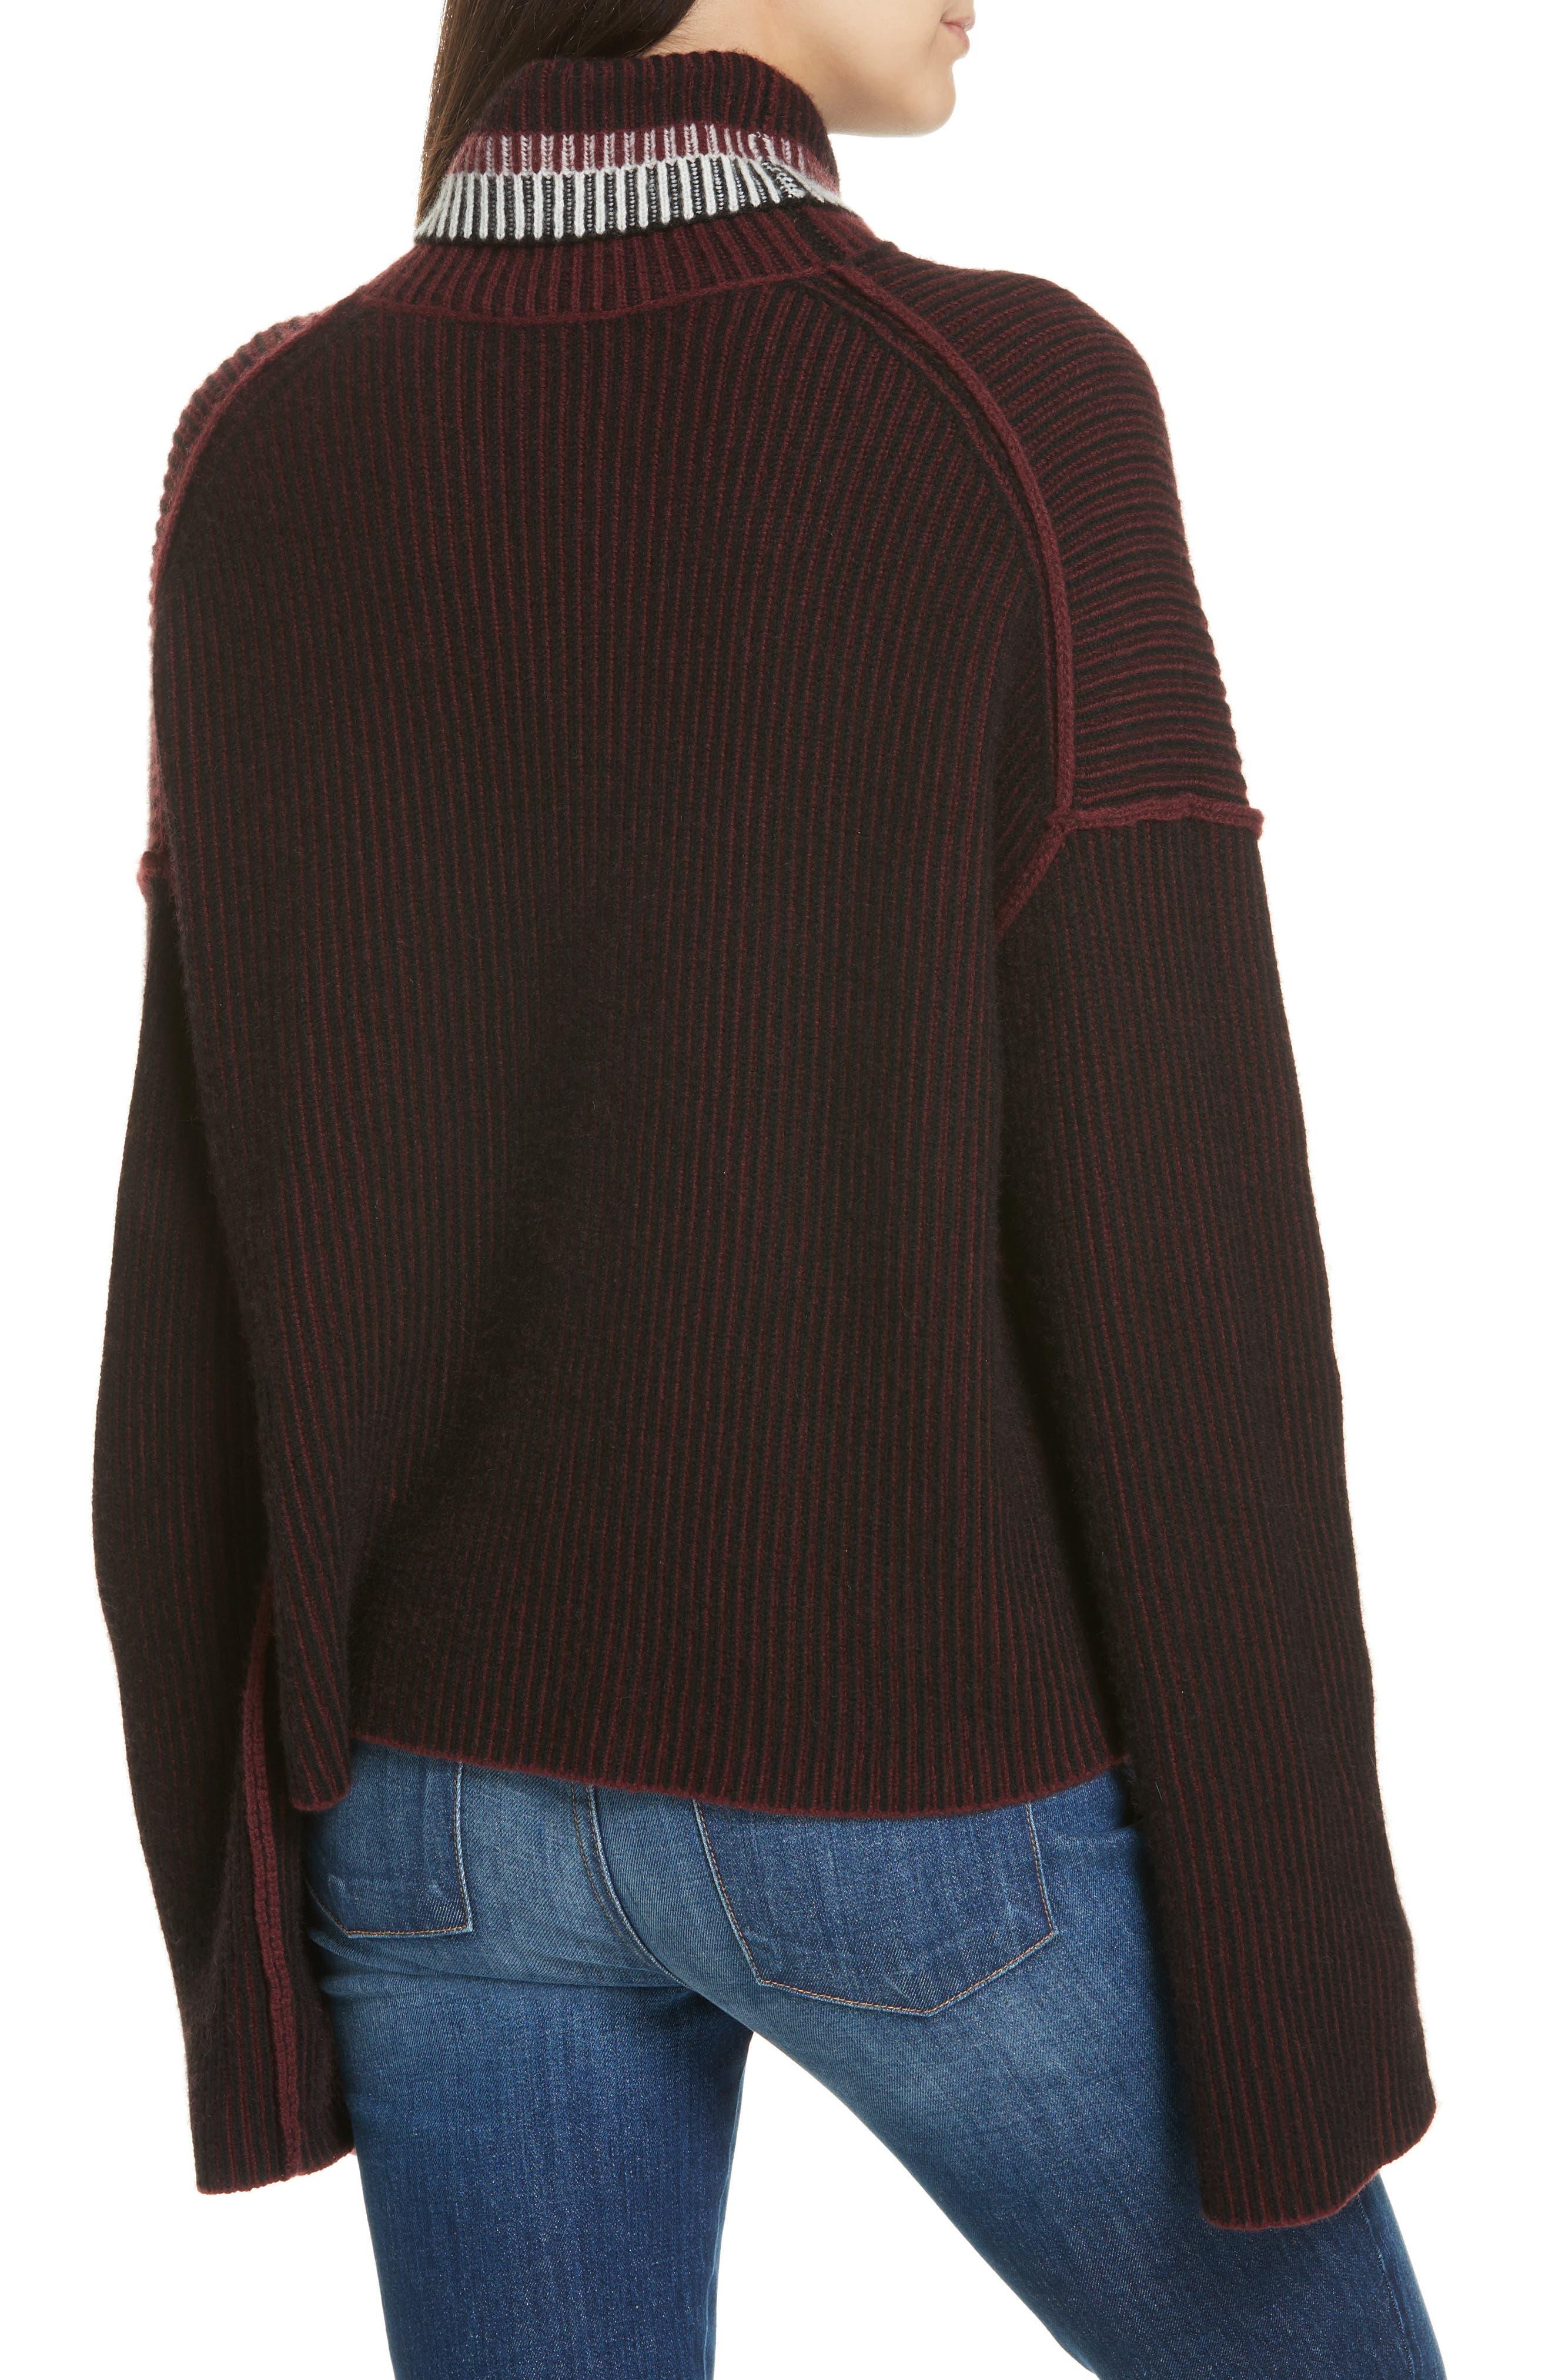 Oversize Cashmere Turtleneck Sweater,                             Alternate thumbnail 2, color,                             DARK CURRANT MIX